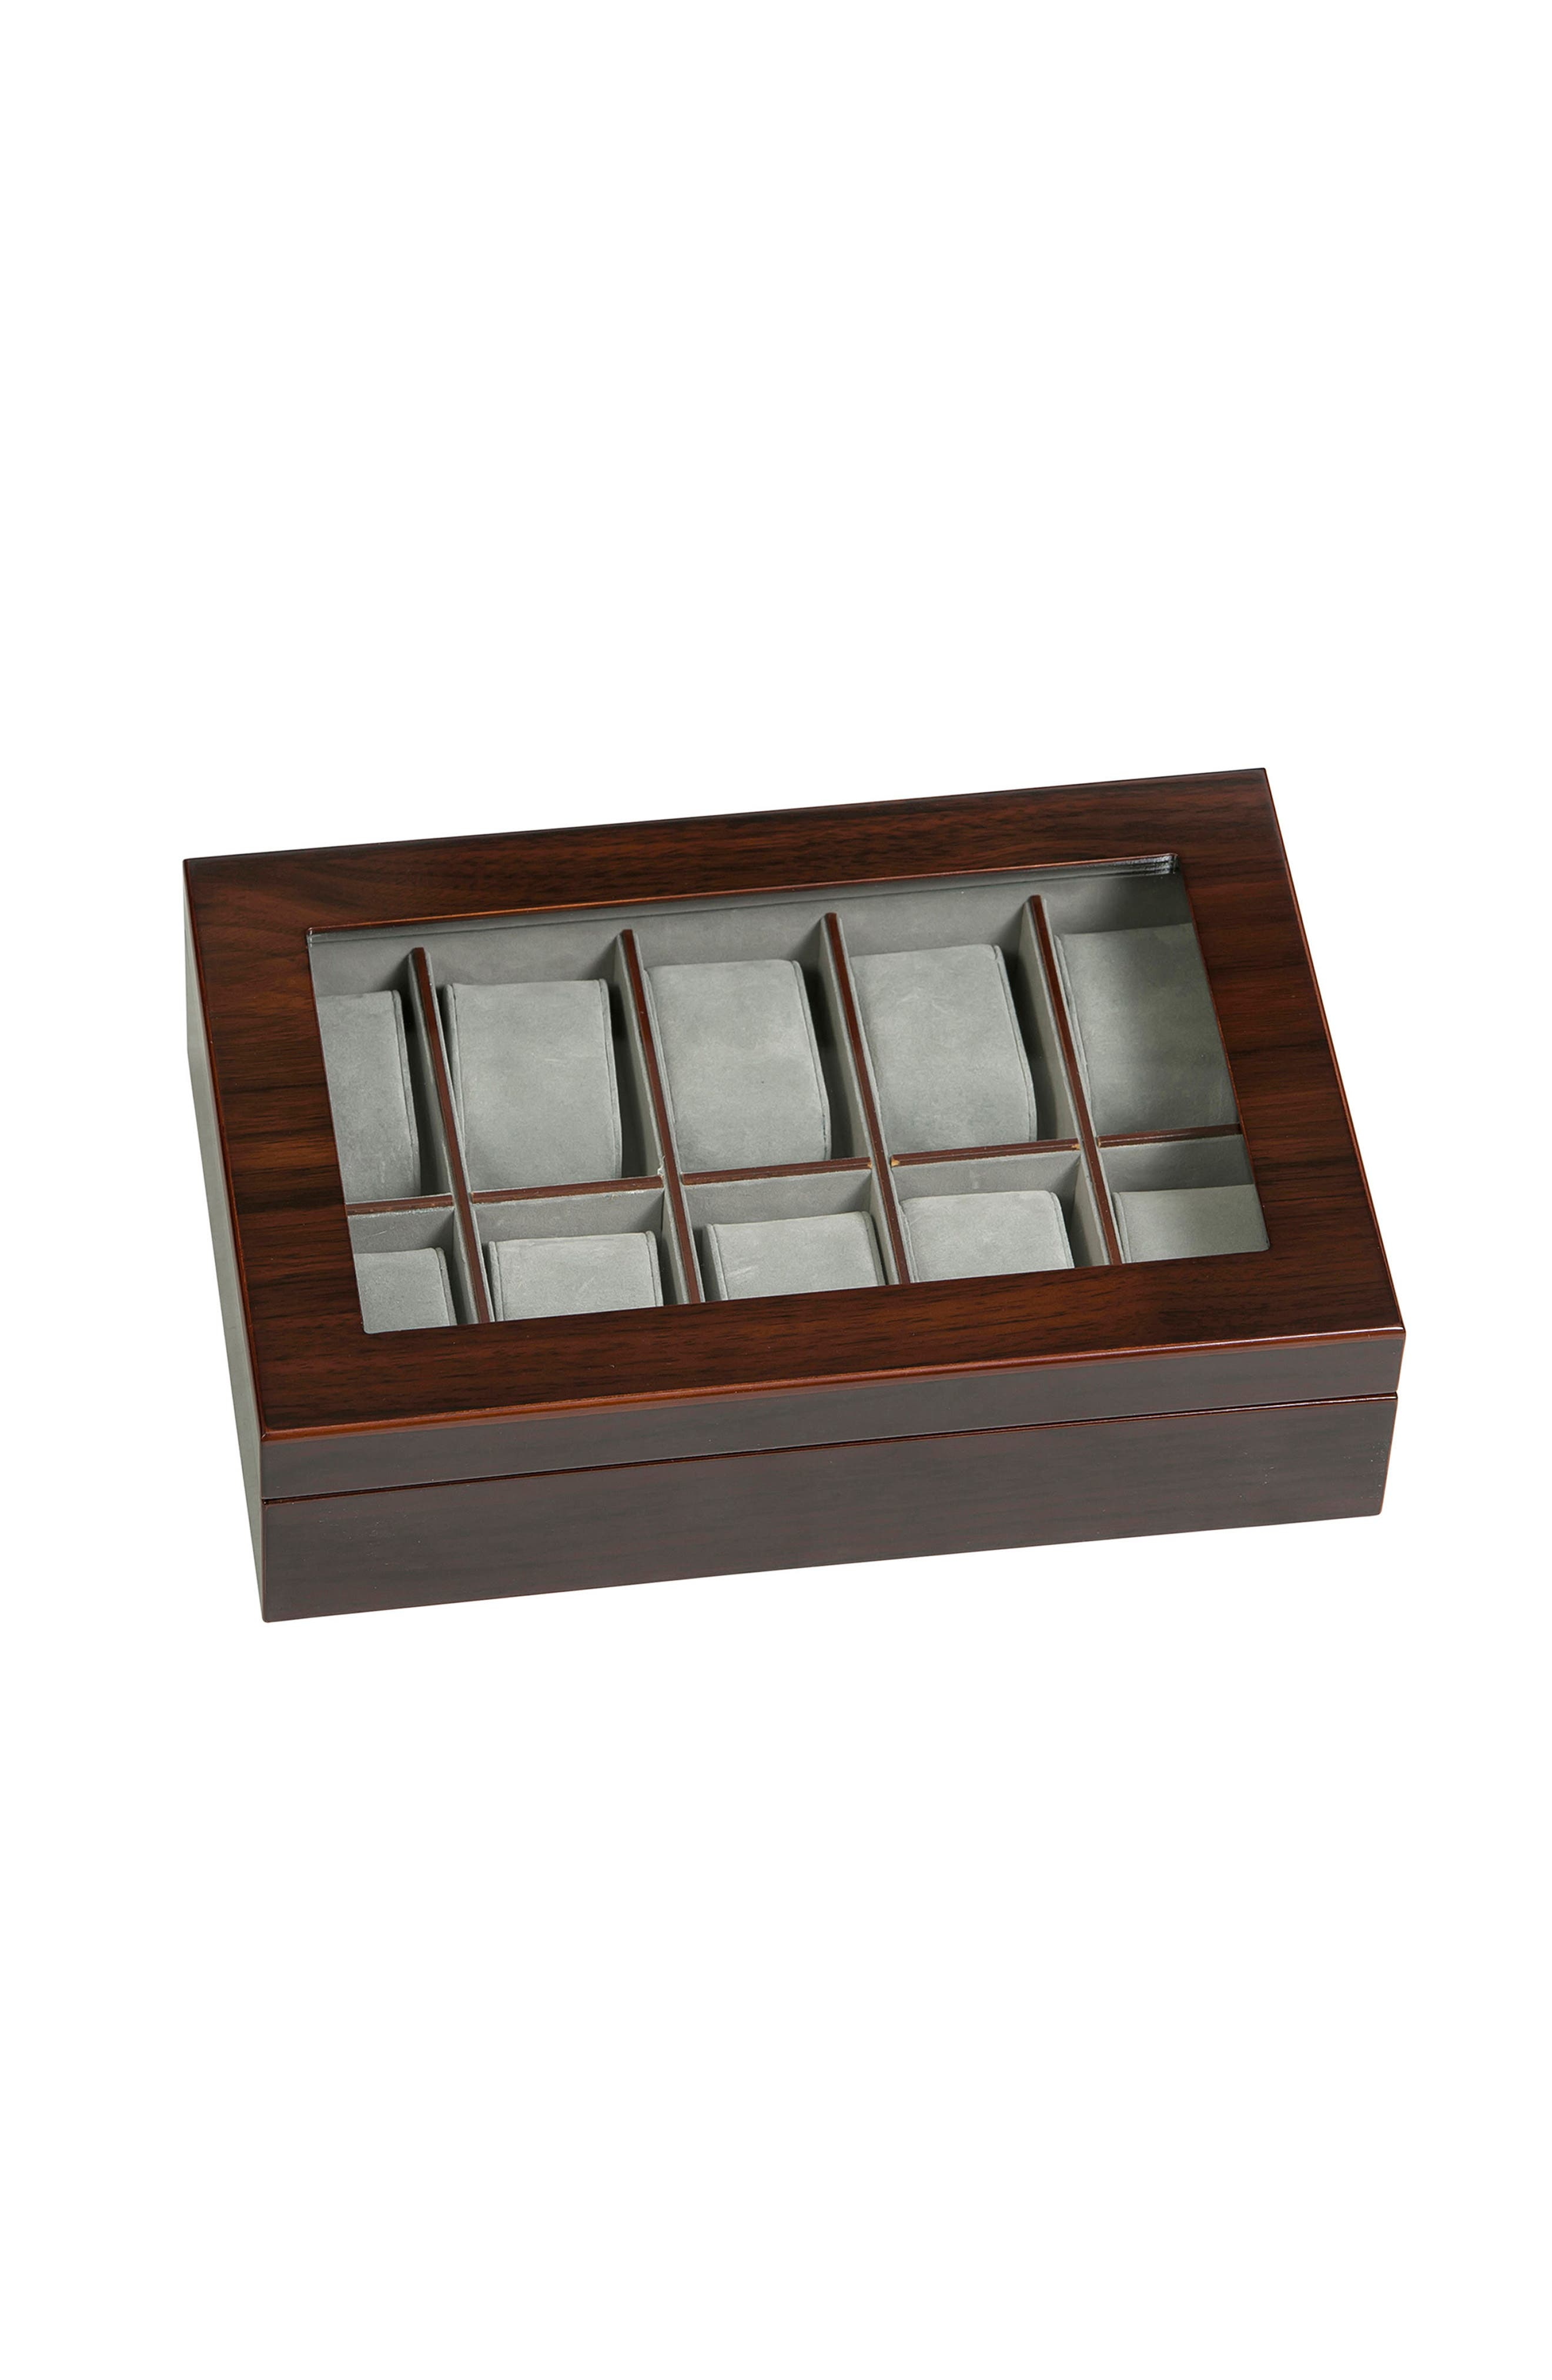 Main Image - Mele & Co. Hudson Glass Top Watch Box